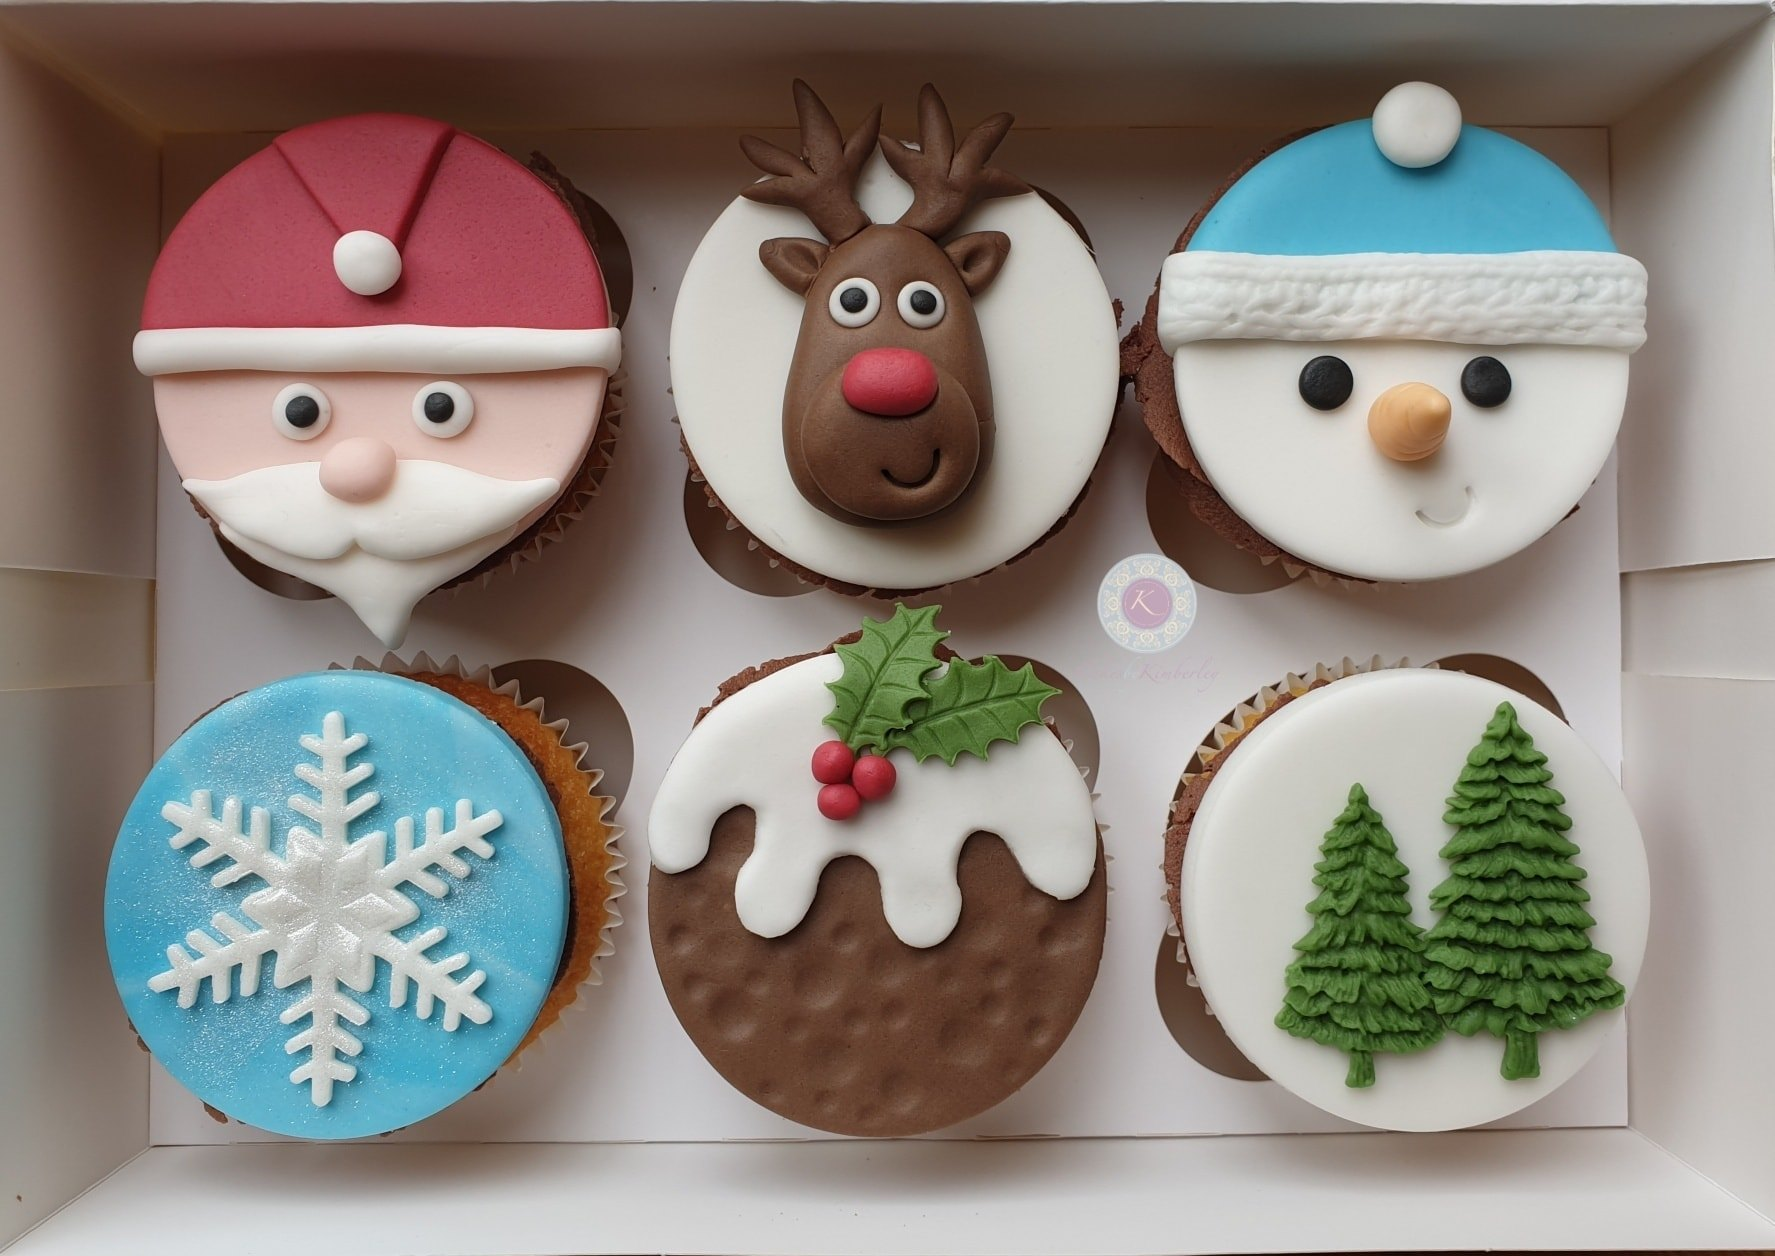 Cupcakes - Xmas mix